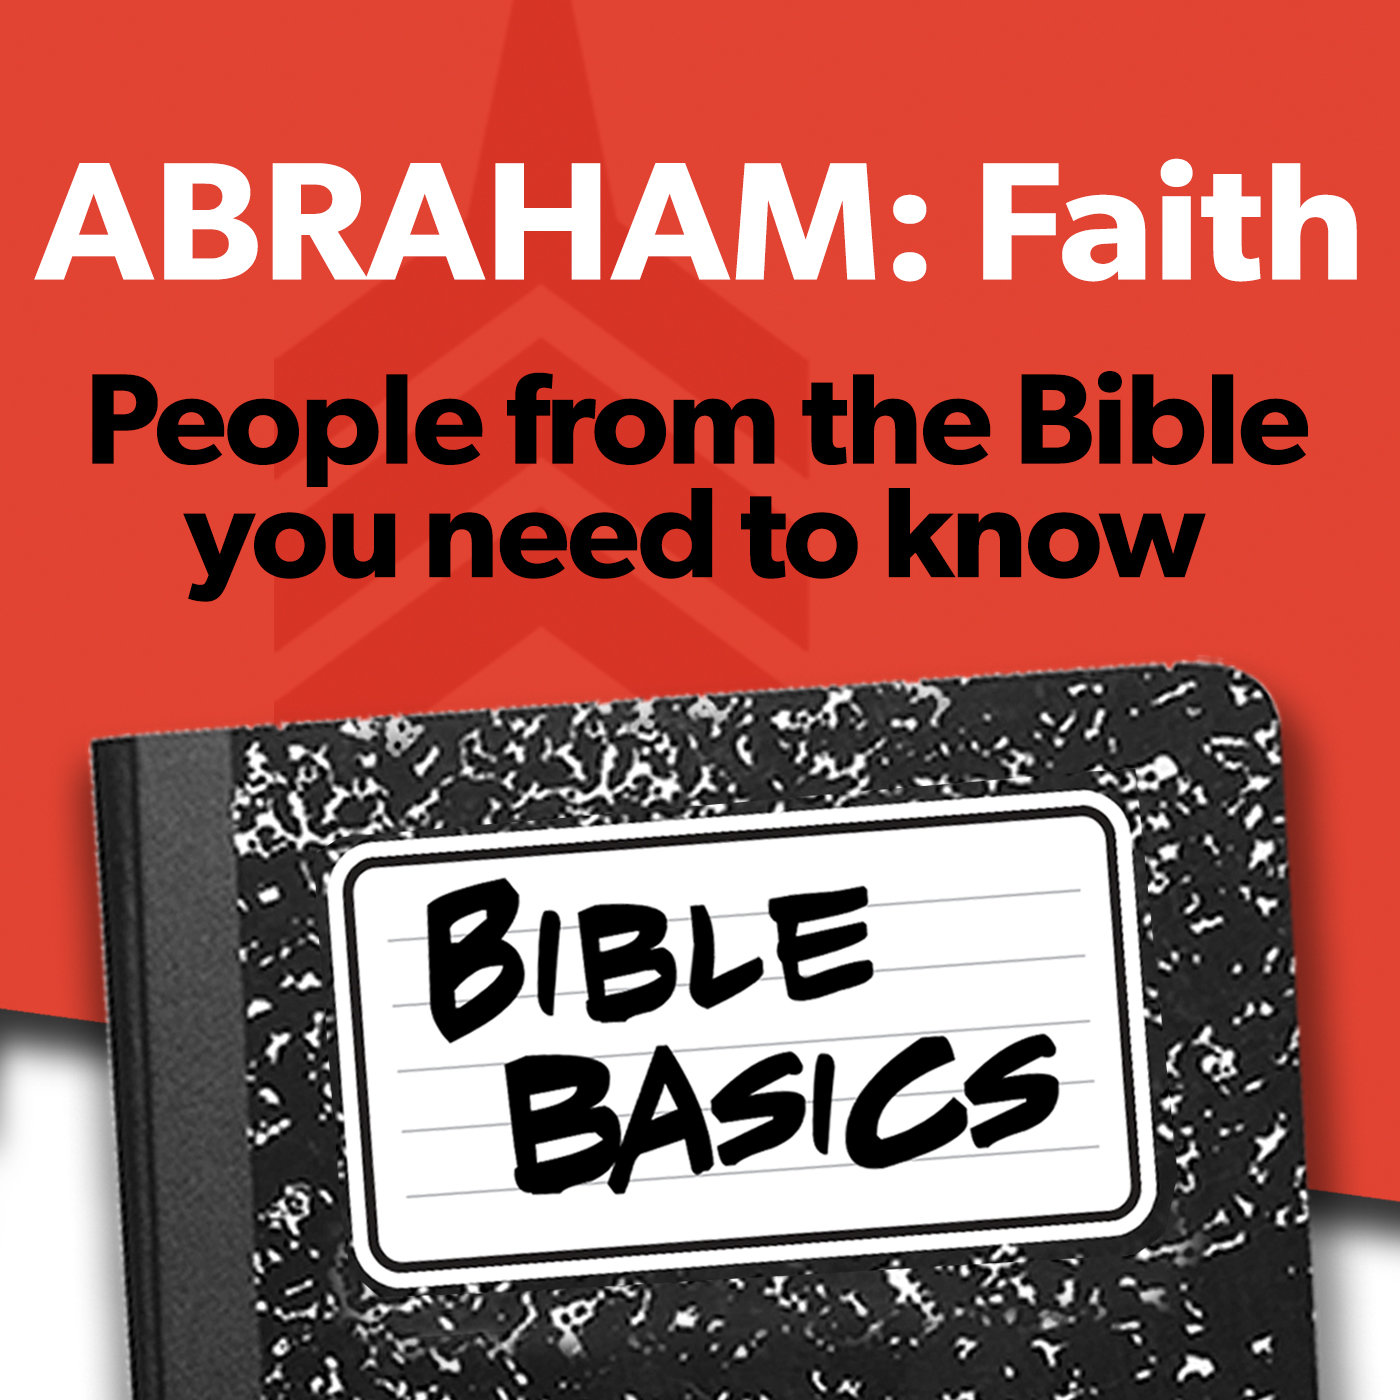 Bible Basics_01_ABRAHAM  FAITH